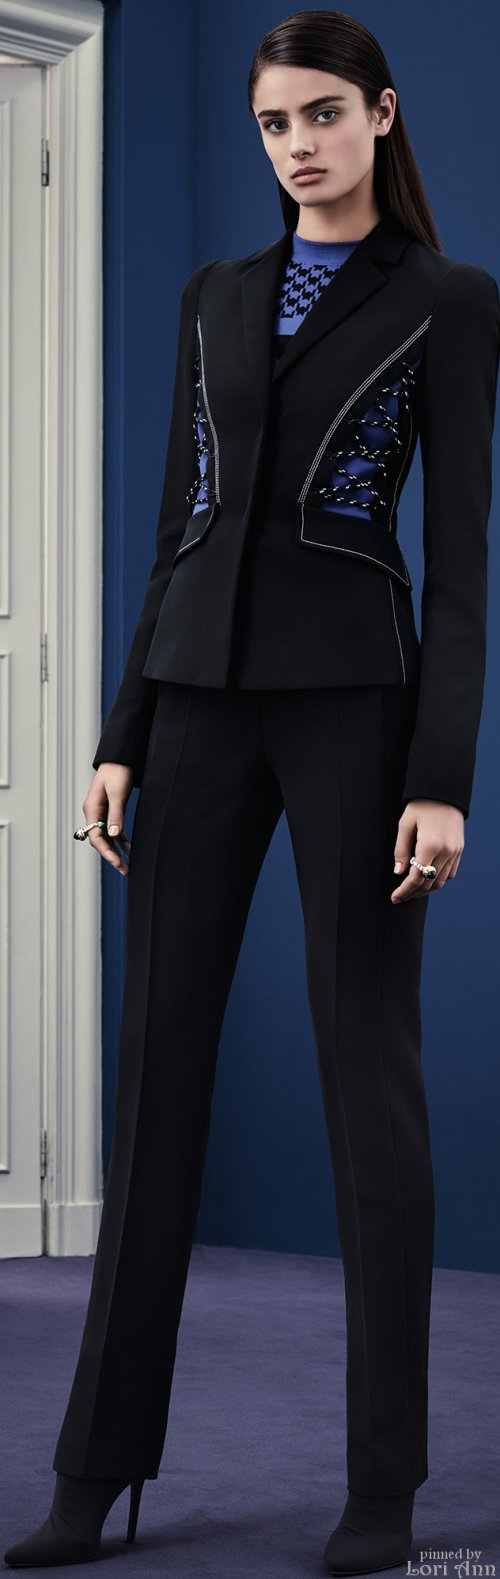 versace prefall 2015 �� prefall 2015 pinterest azul